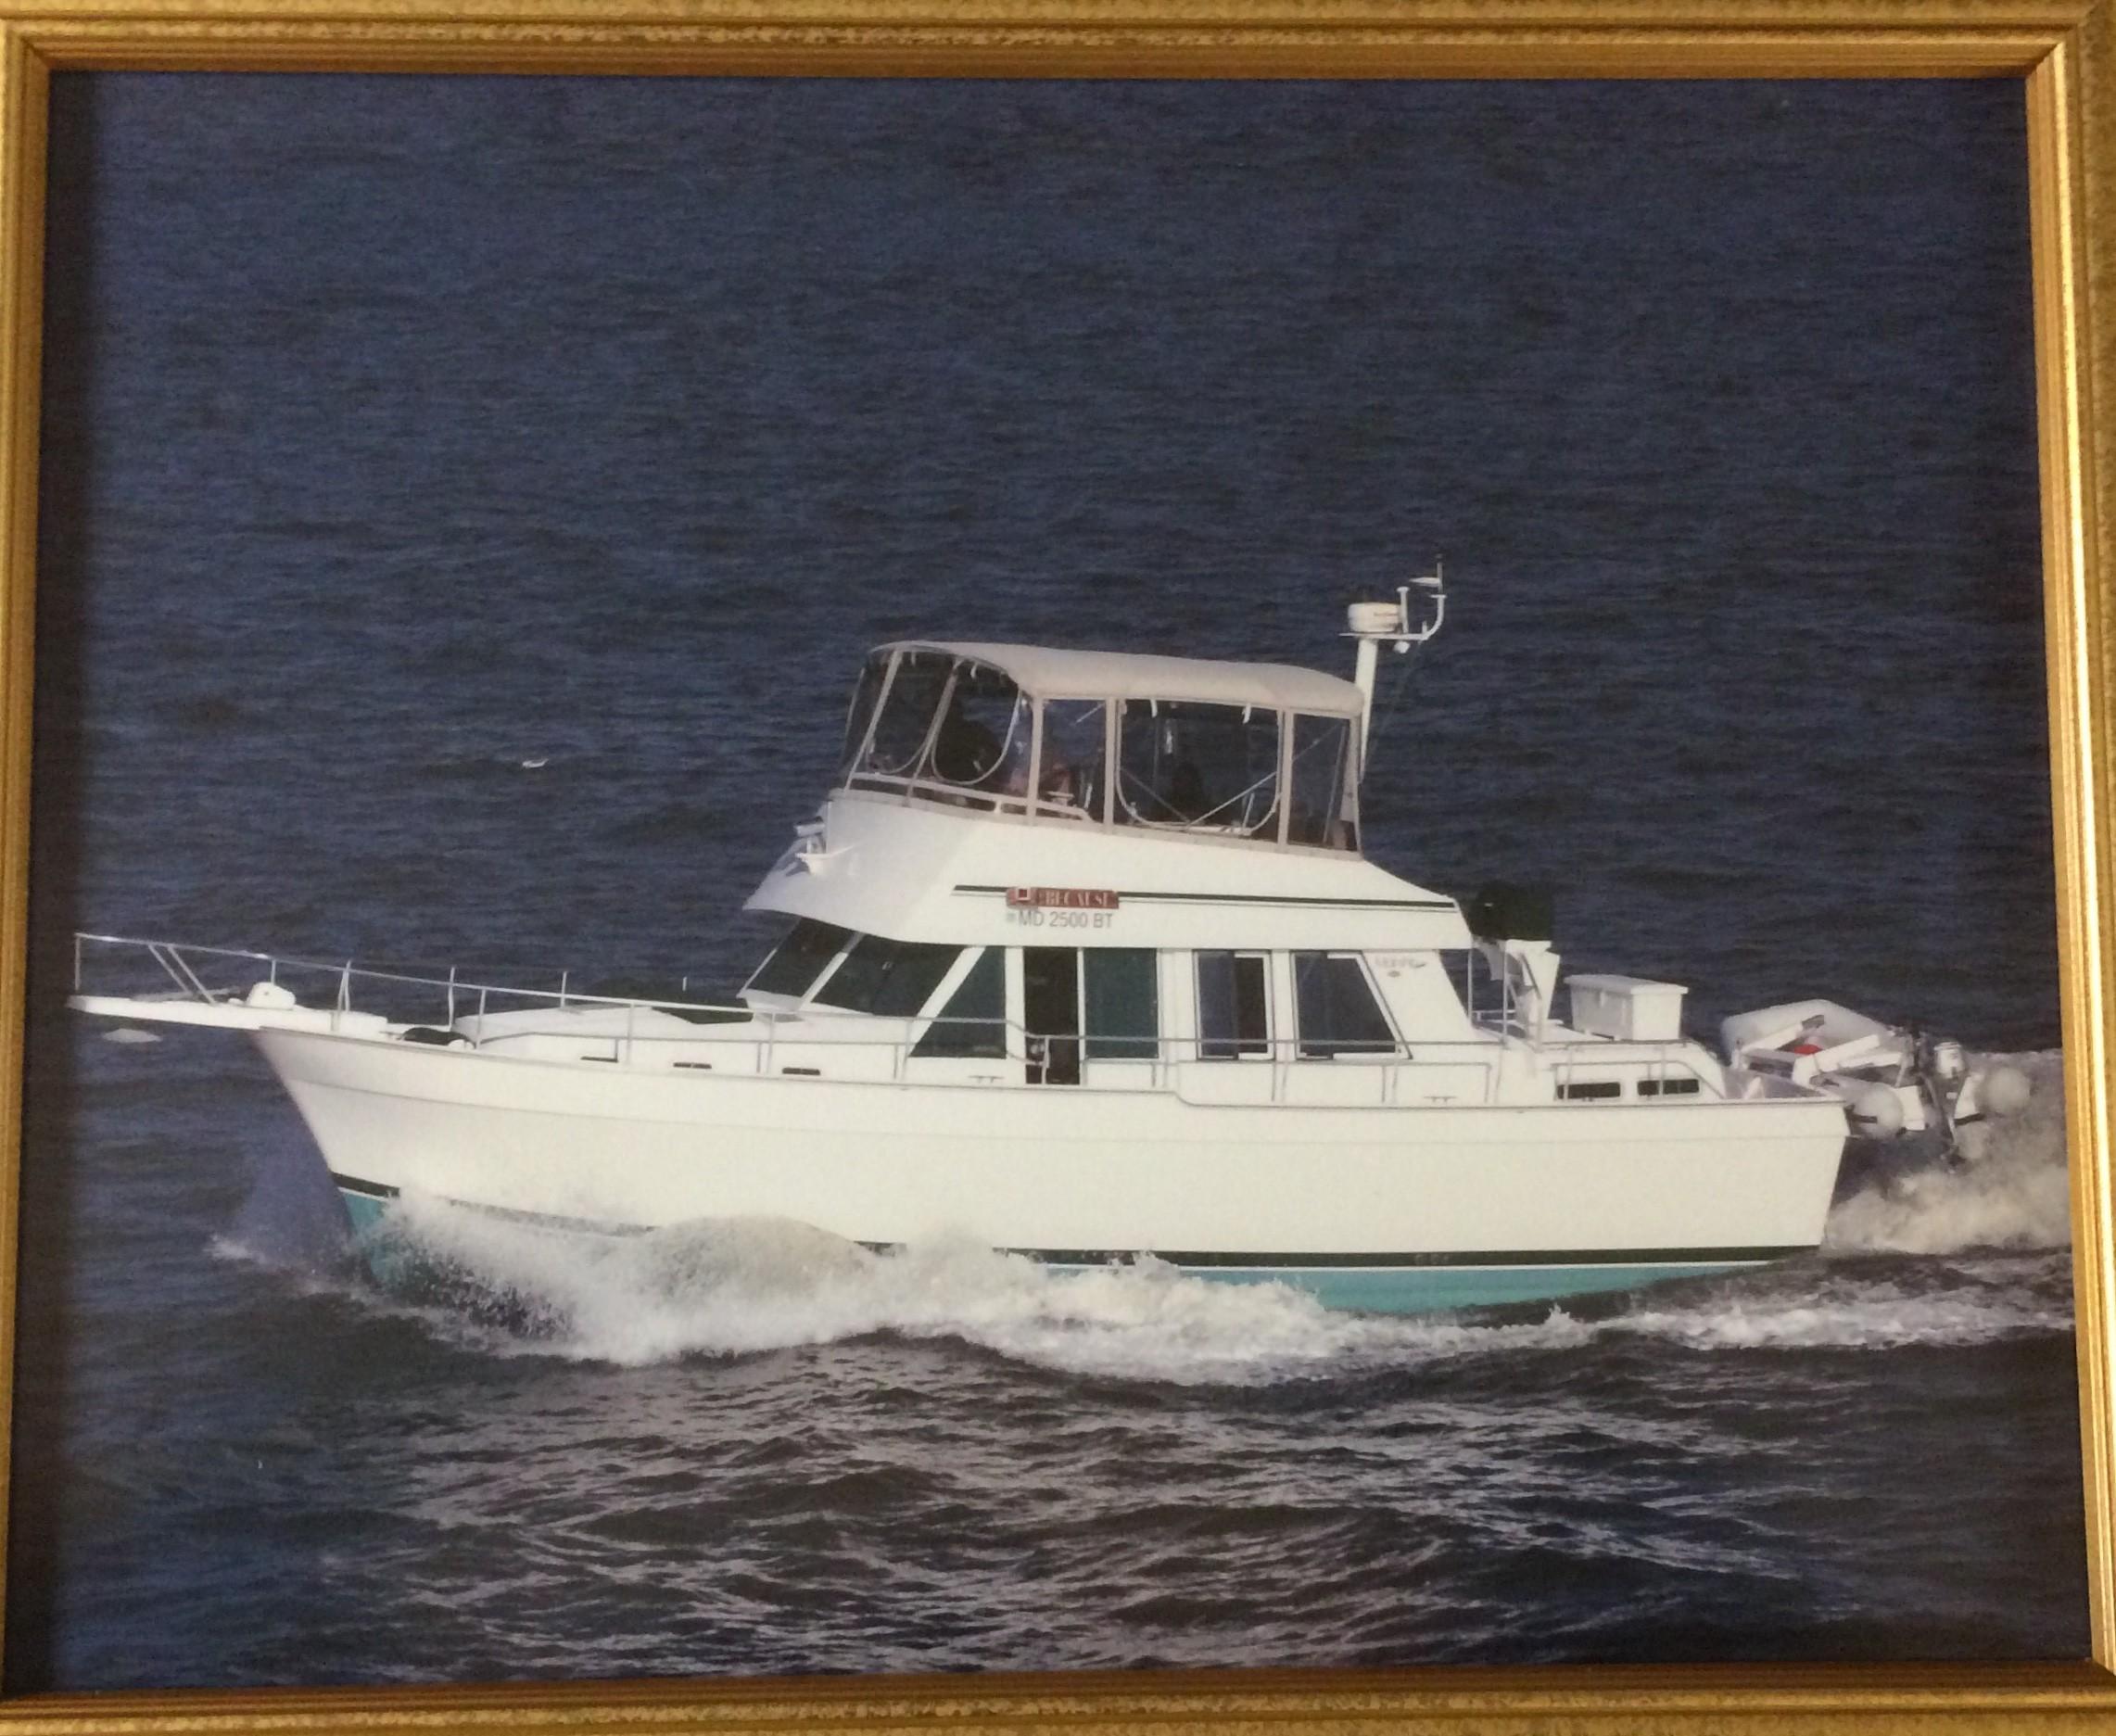 43' Mainship 2000